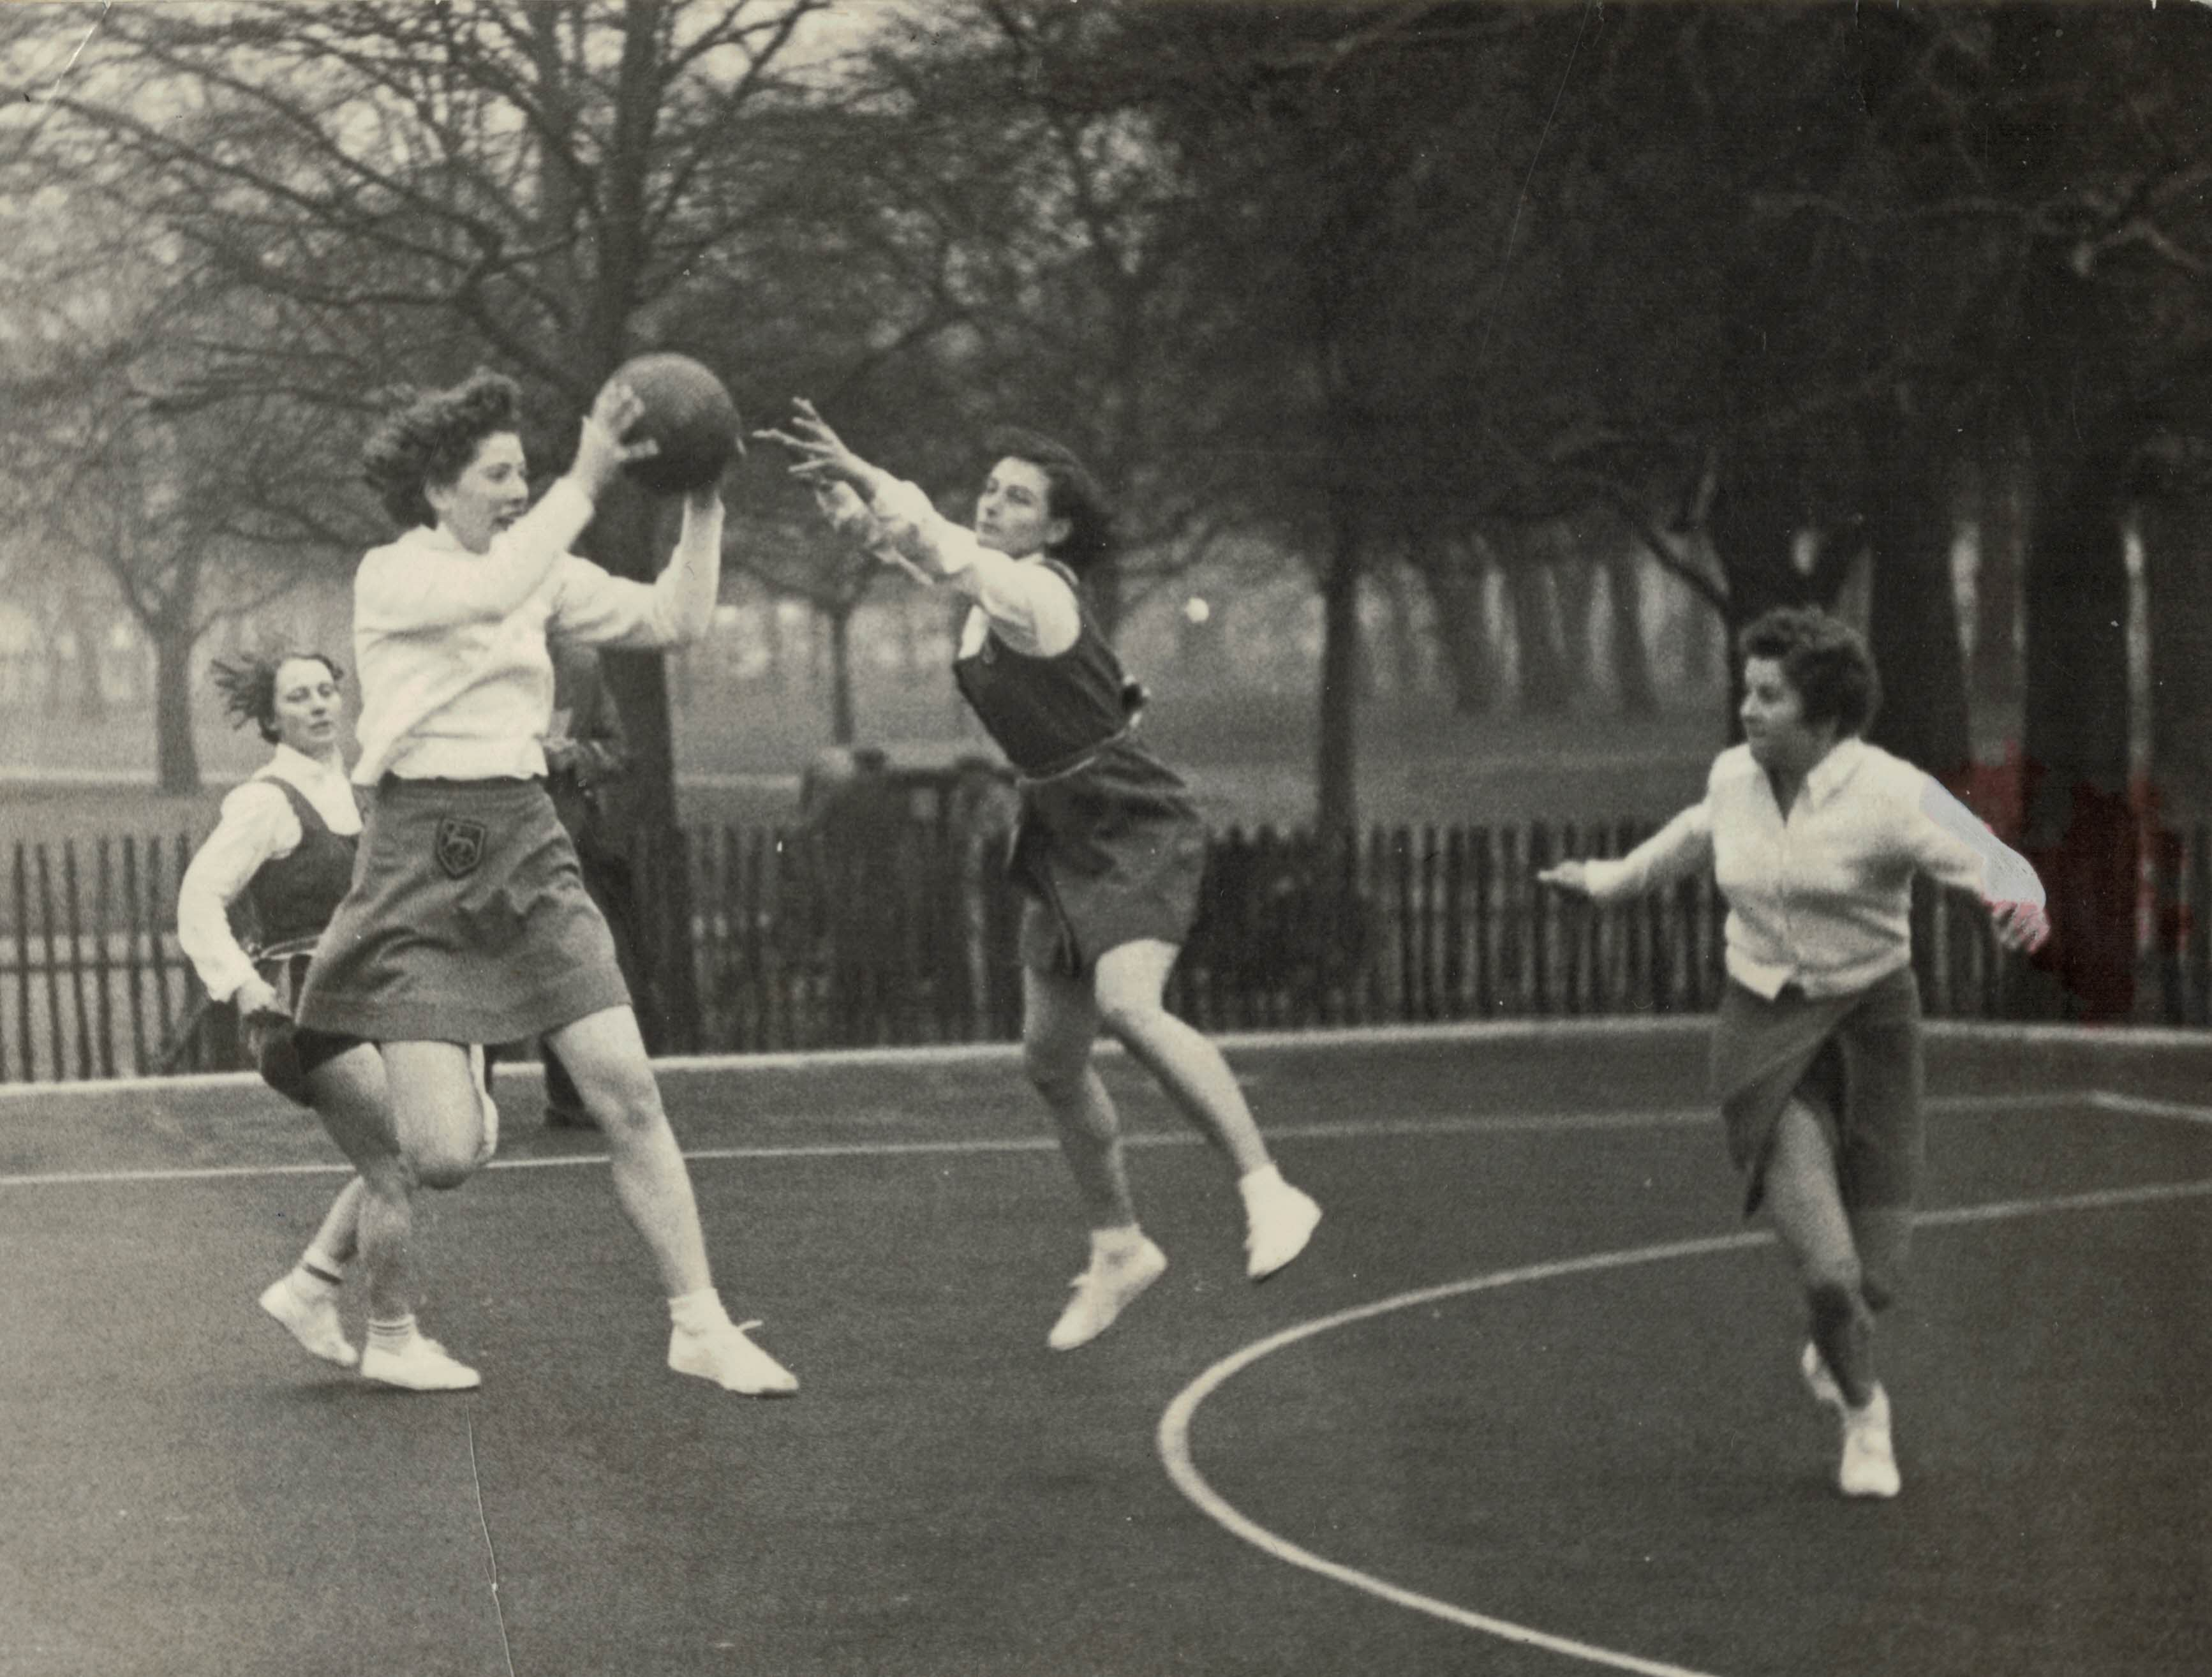 1955 Surry v Essex, Clapham Common